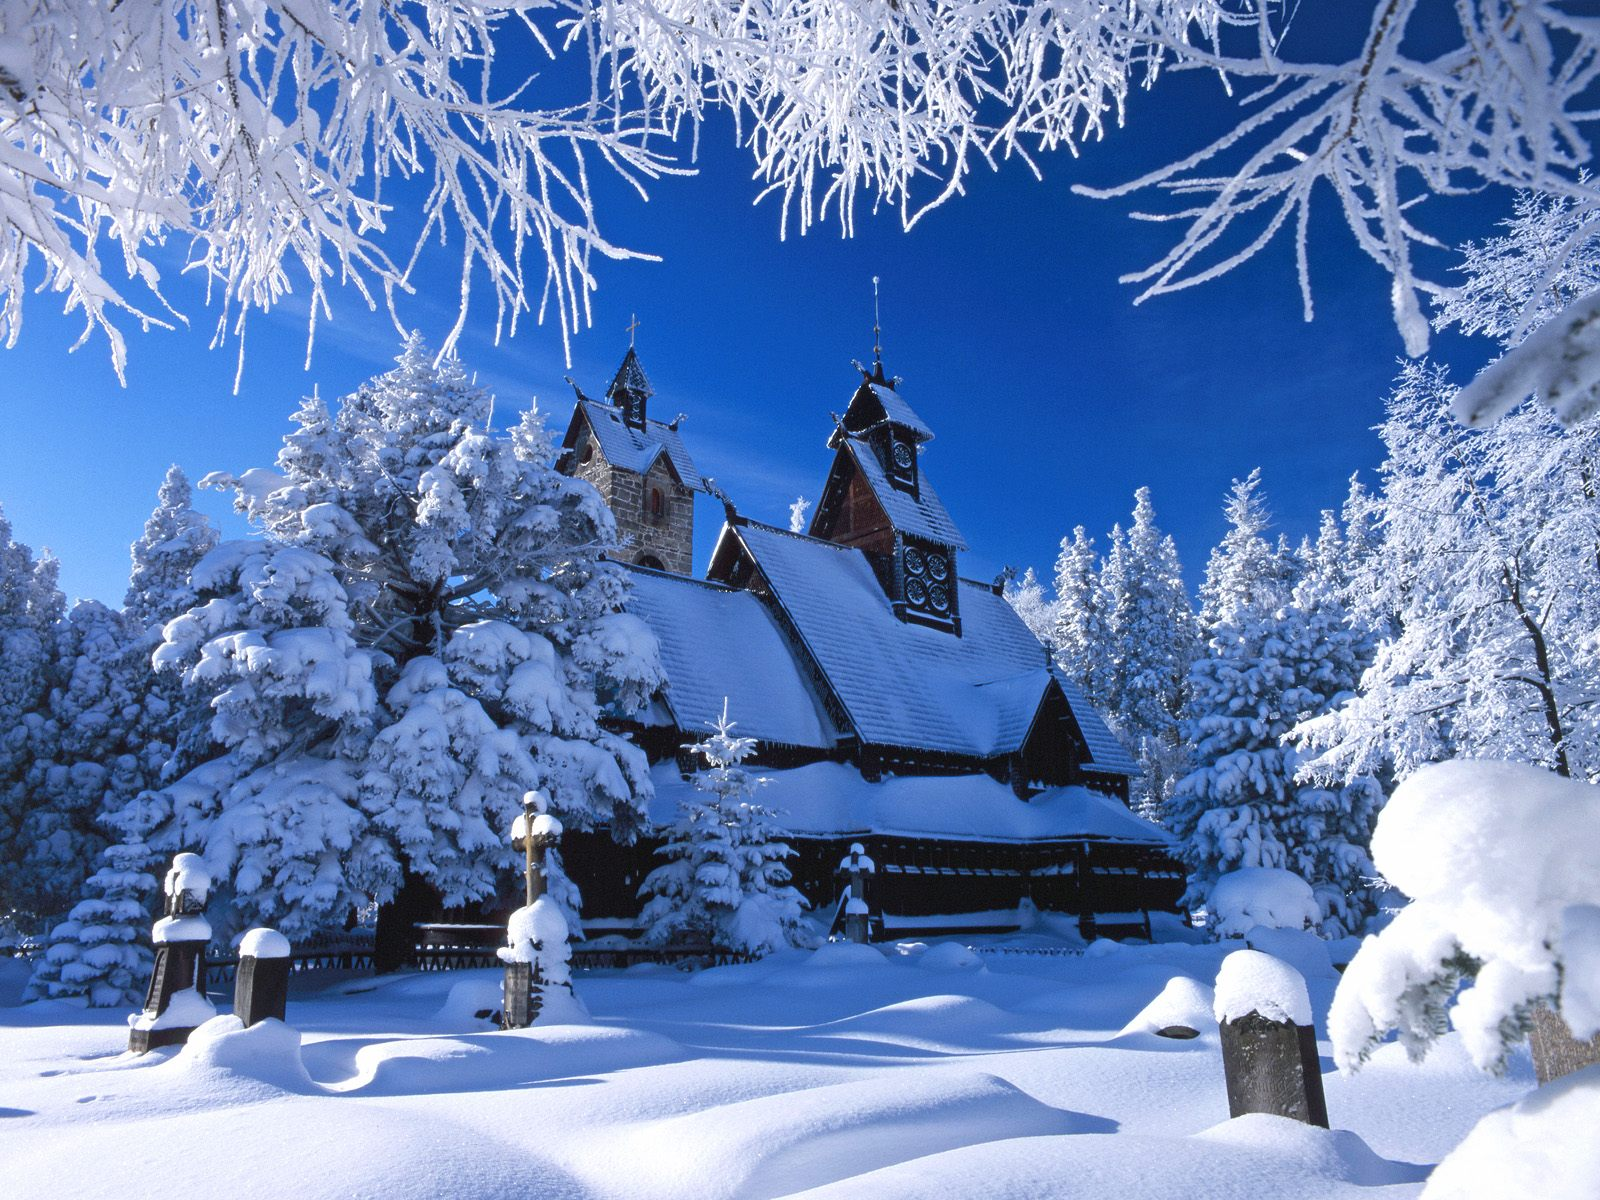 http://3.bp.blogspot.com/-T4z54xaG5Xo/TxBVuoOm63I/AAAAAAAAC5w/-4dNmWhi2EY/s1600/Winter+Desktop+Wallpapers.jpg